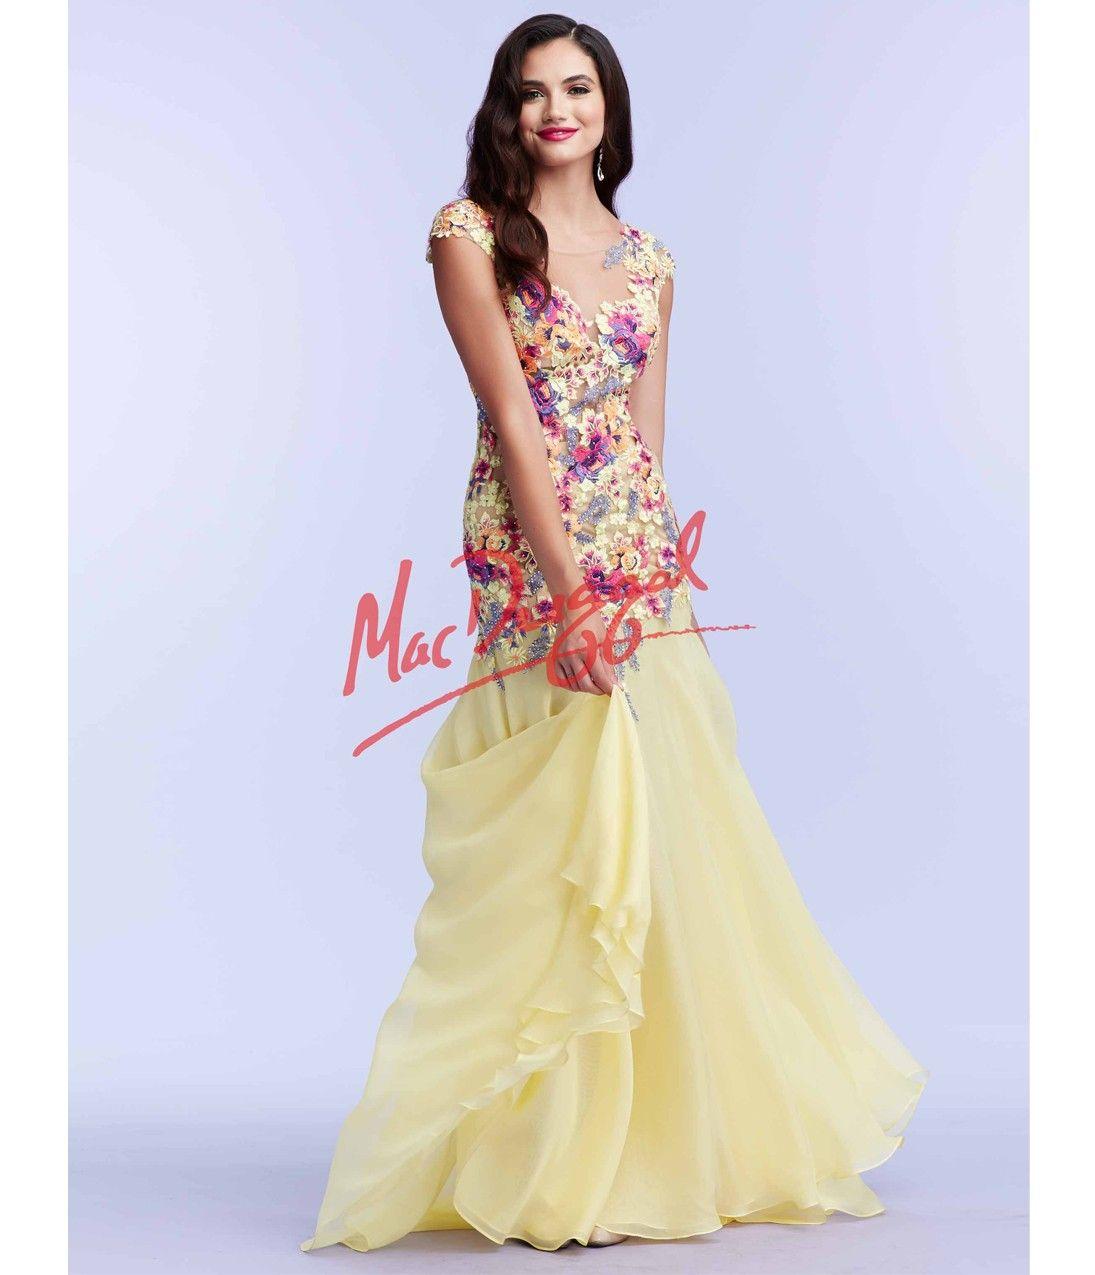 Floral embroidered drop waist yellow dress kobieta sukienki